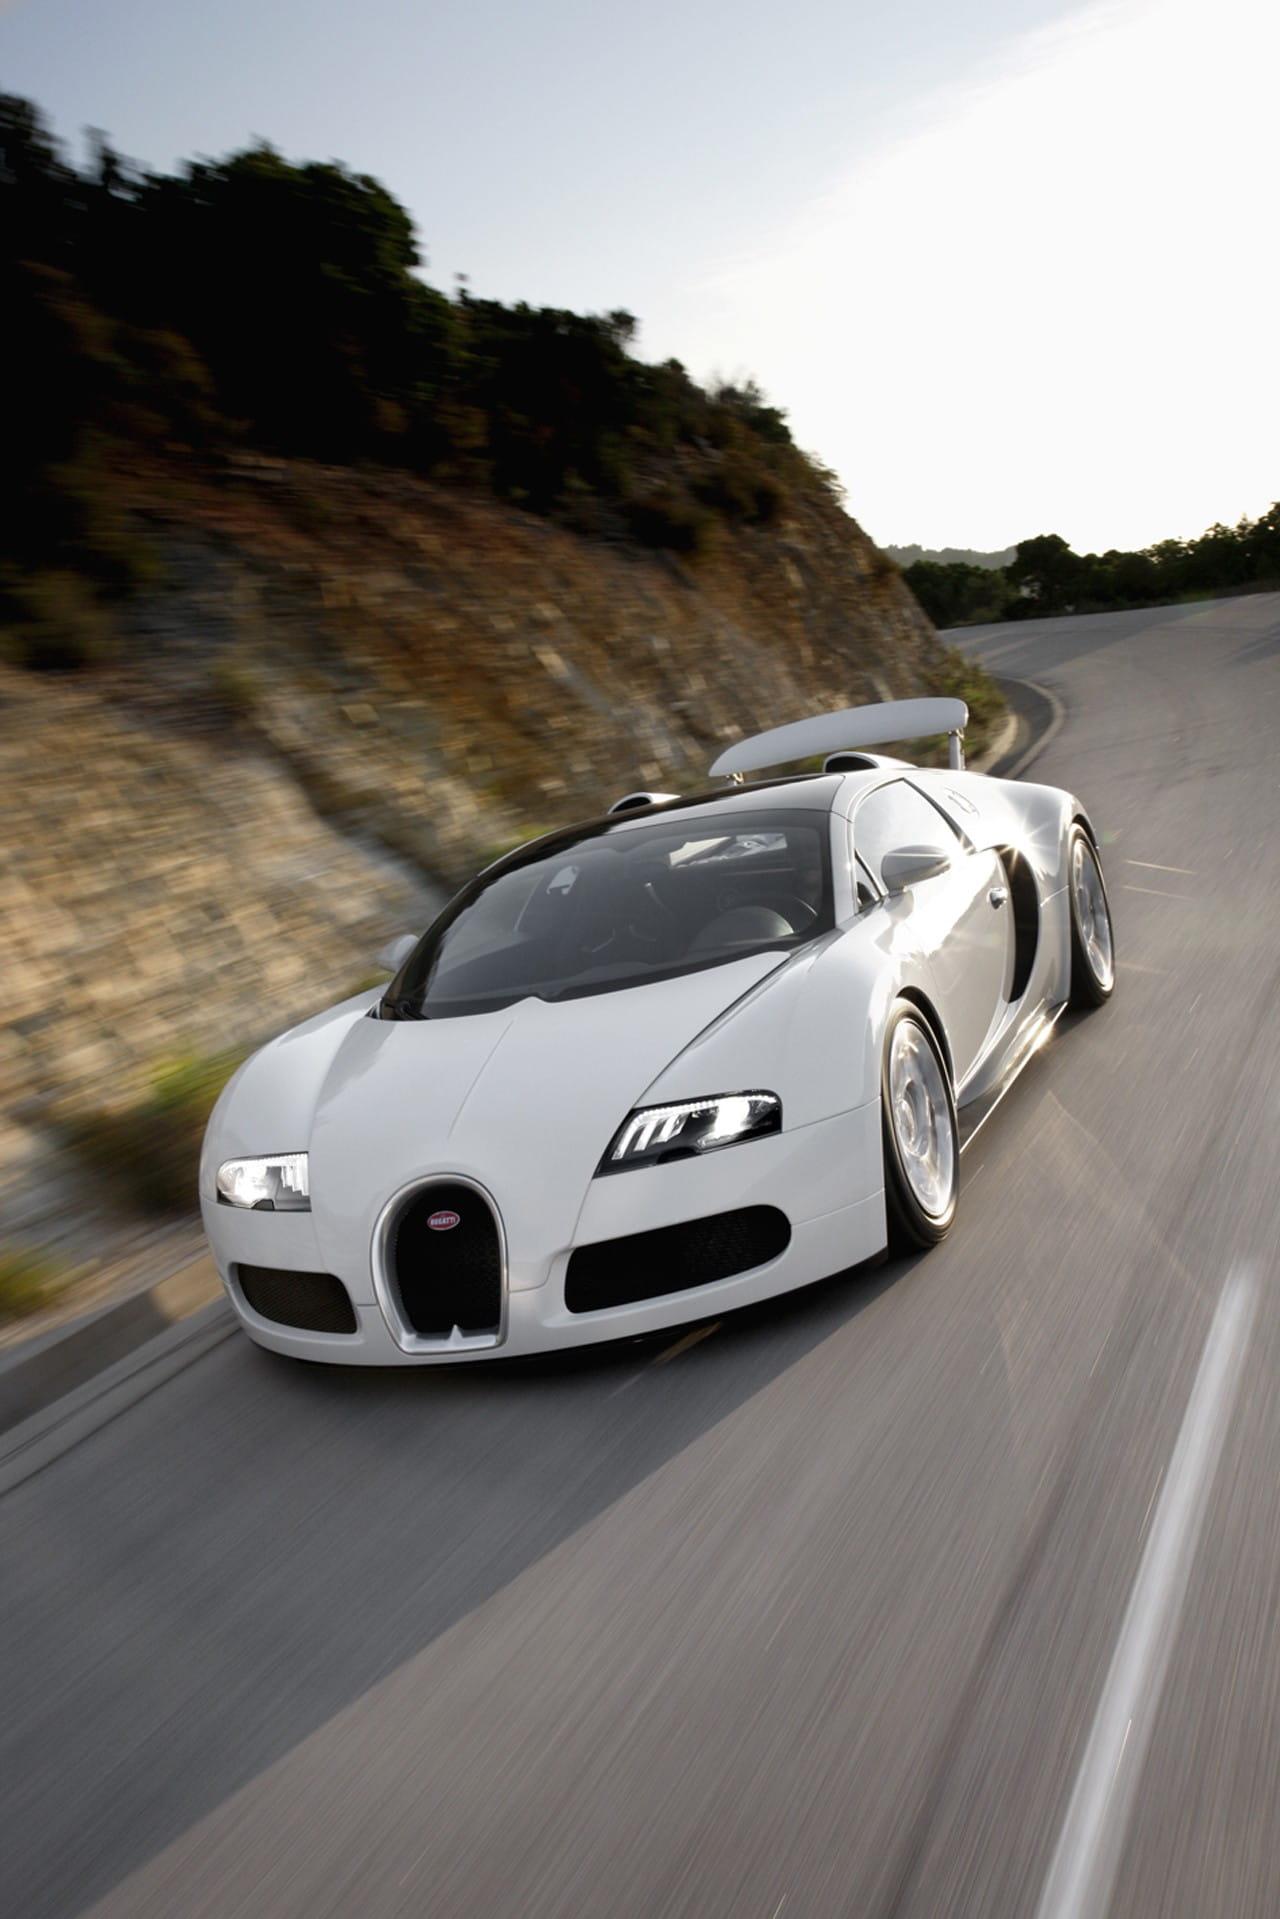 bugatti_veyron_grand_sport_21 Remarkable Bugatti Veyron Grand Sport Vitesse Informacion Cars Trend